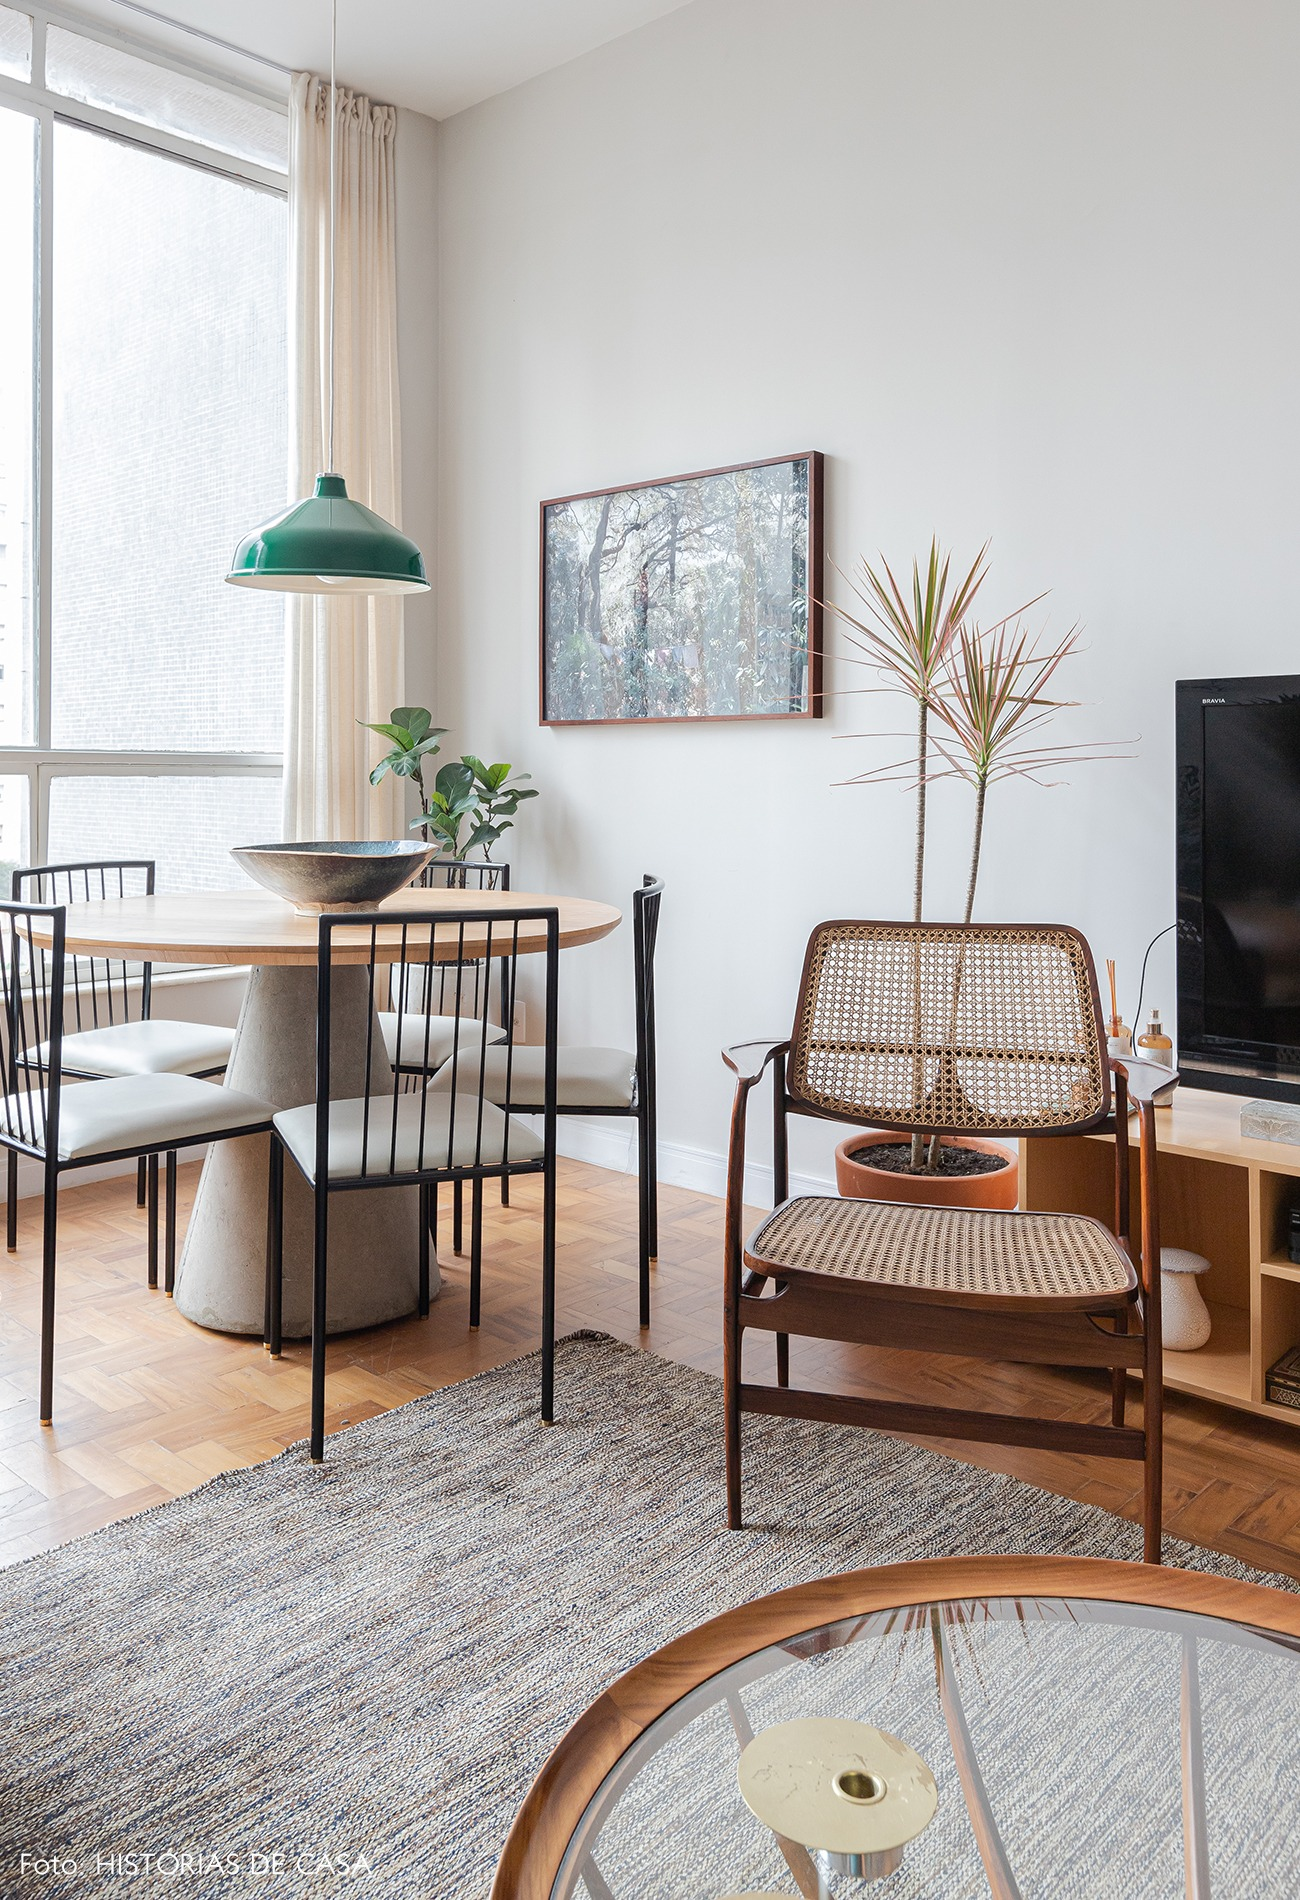 sala-mesa-jantar-concreto-cadeiras-tapete-cinza-mesa-vidro-redonda